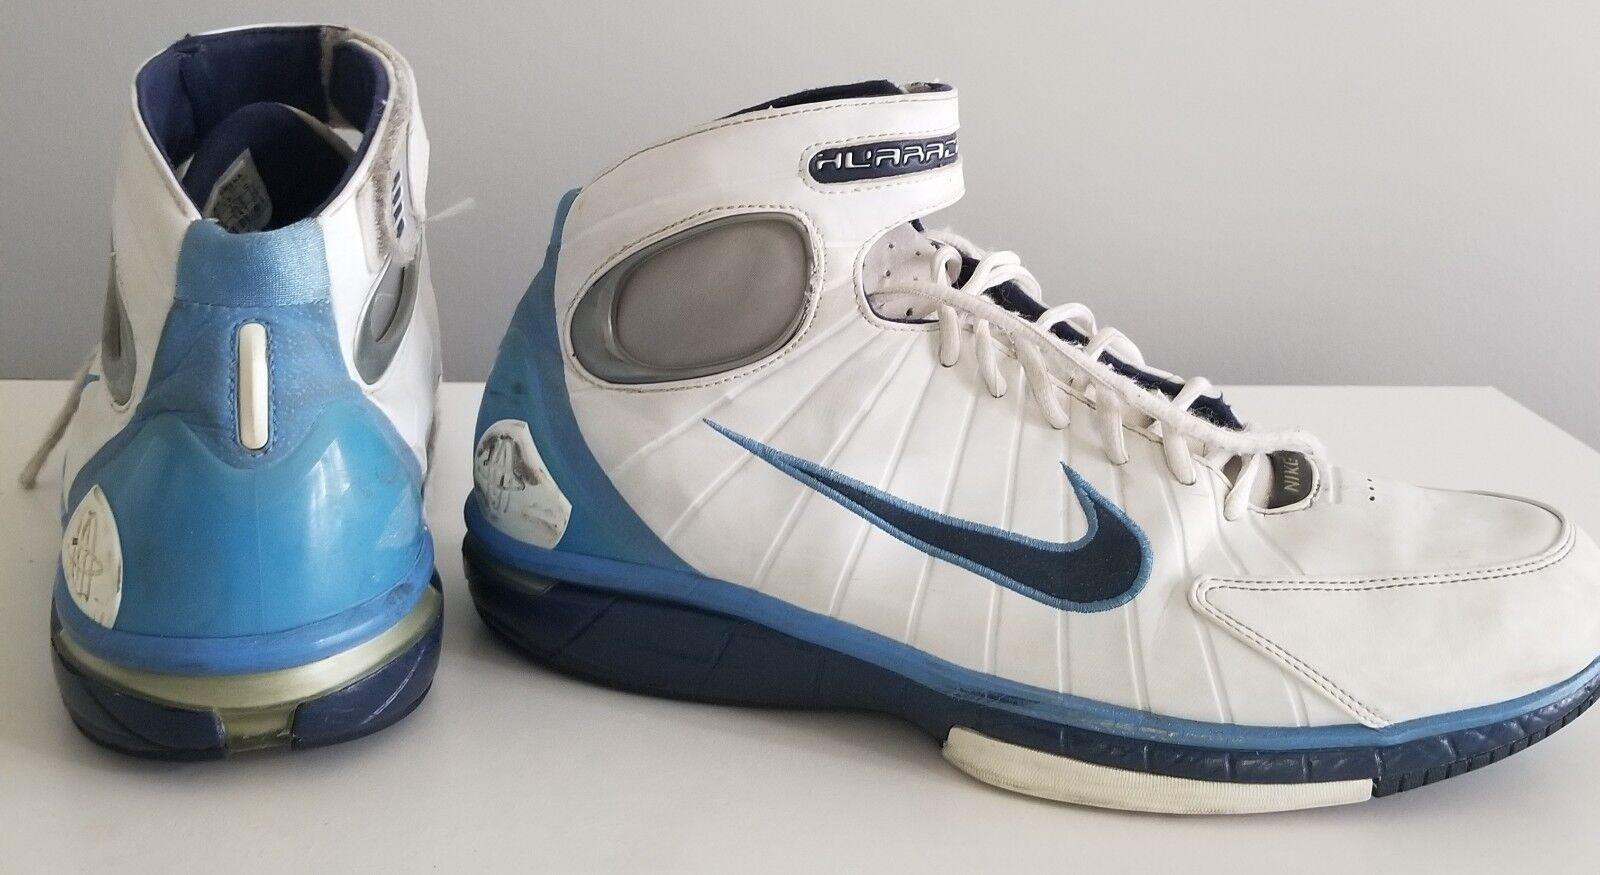 Nike Air Zoom Huarache 2k4 Kobe ORIGINAL 2004 size 15 Great discount